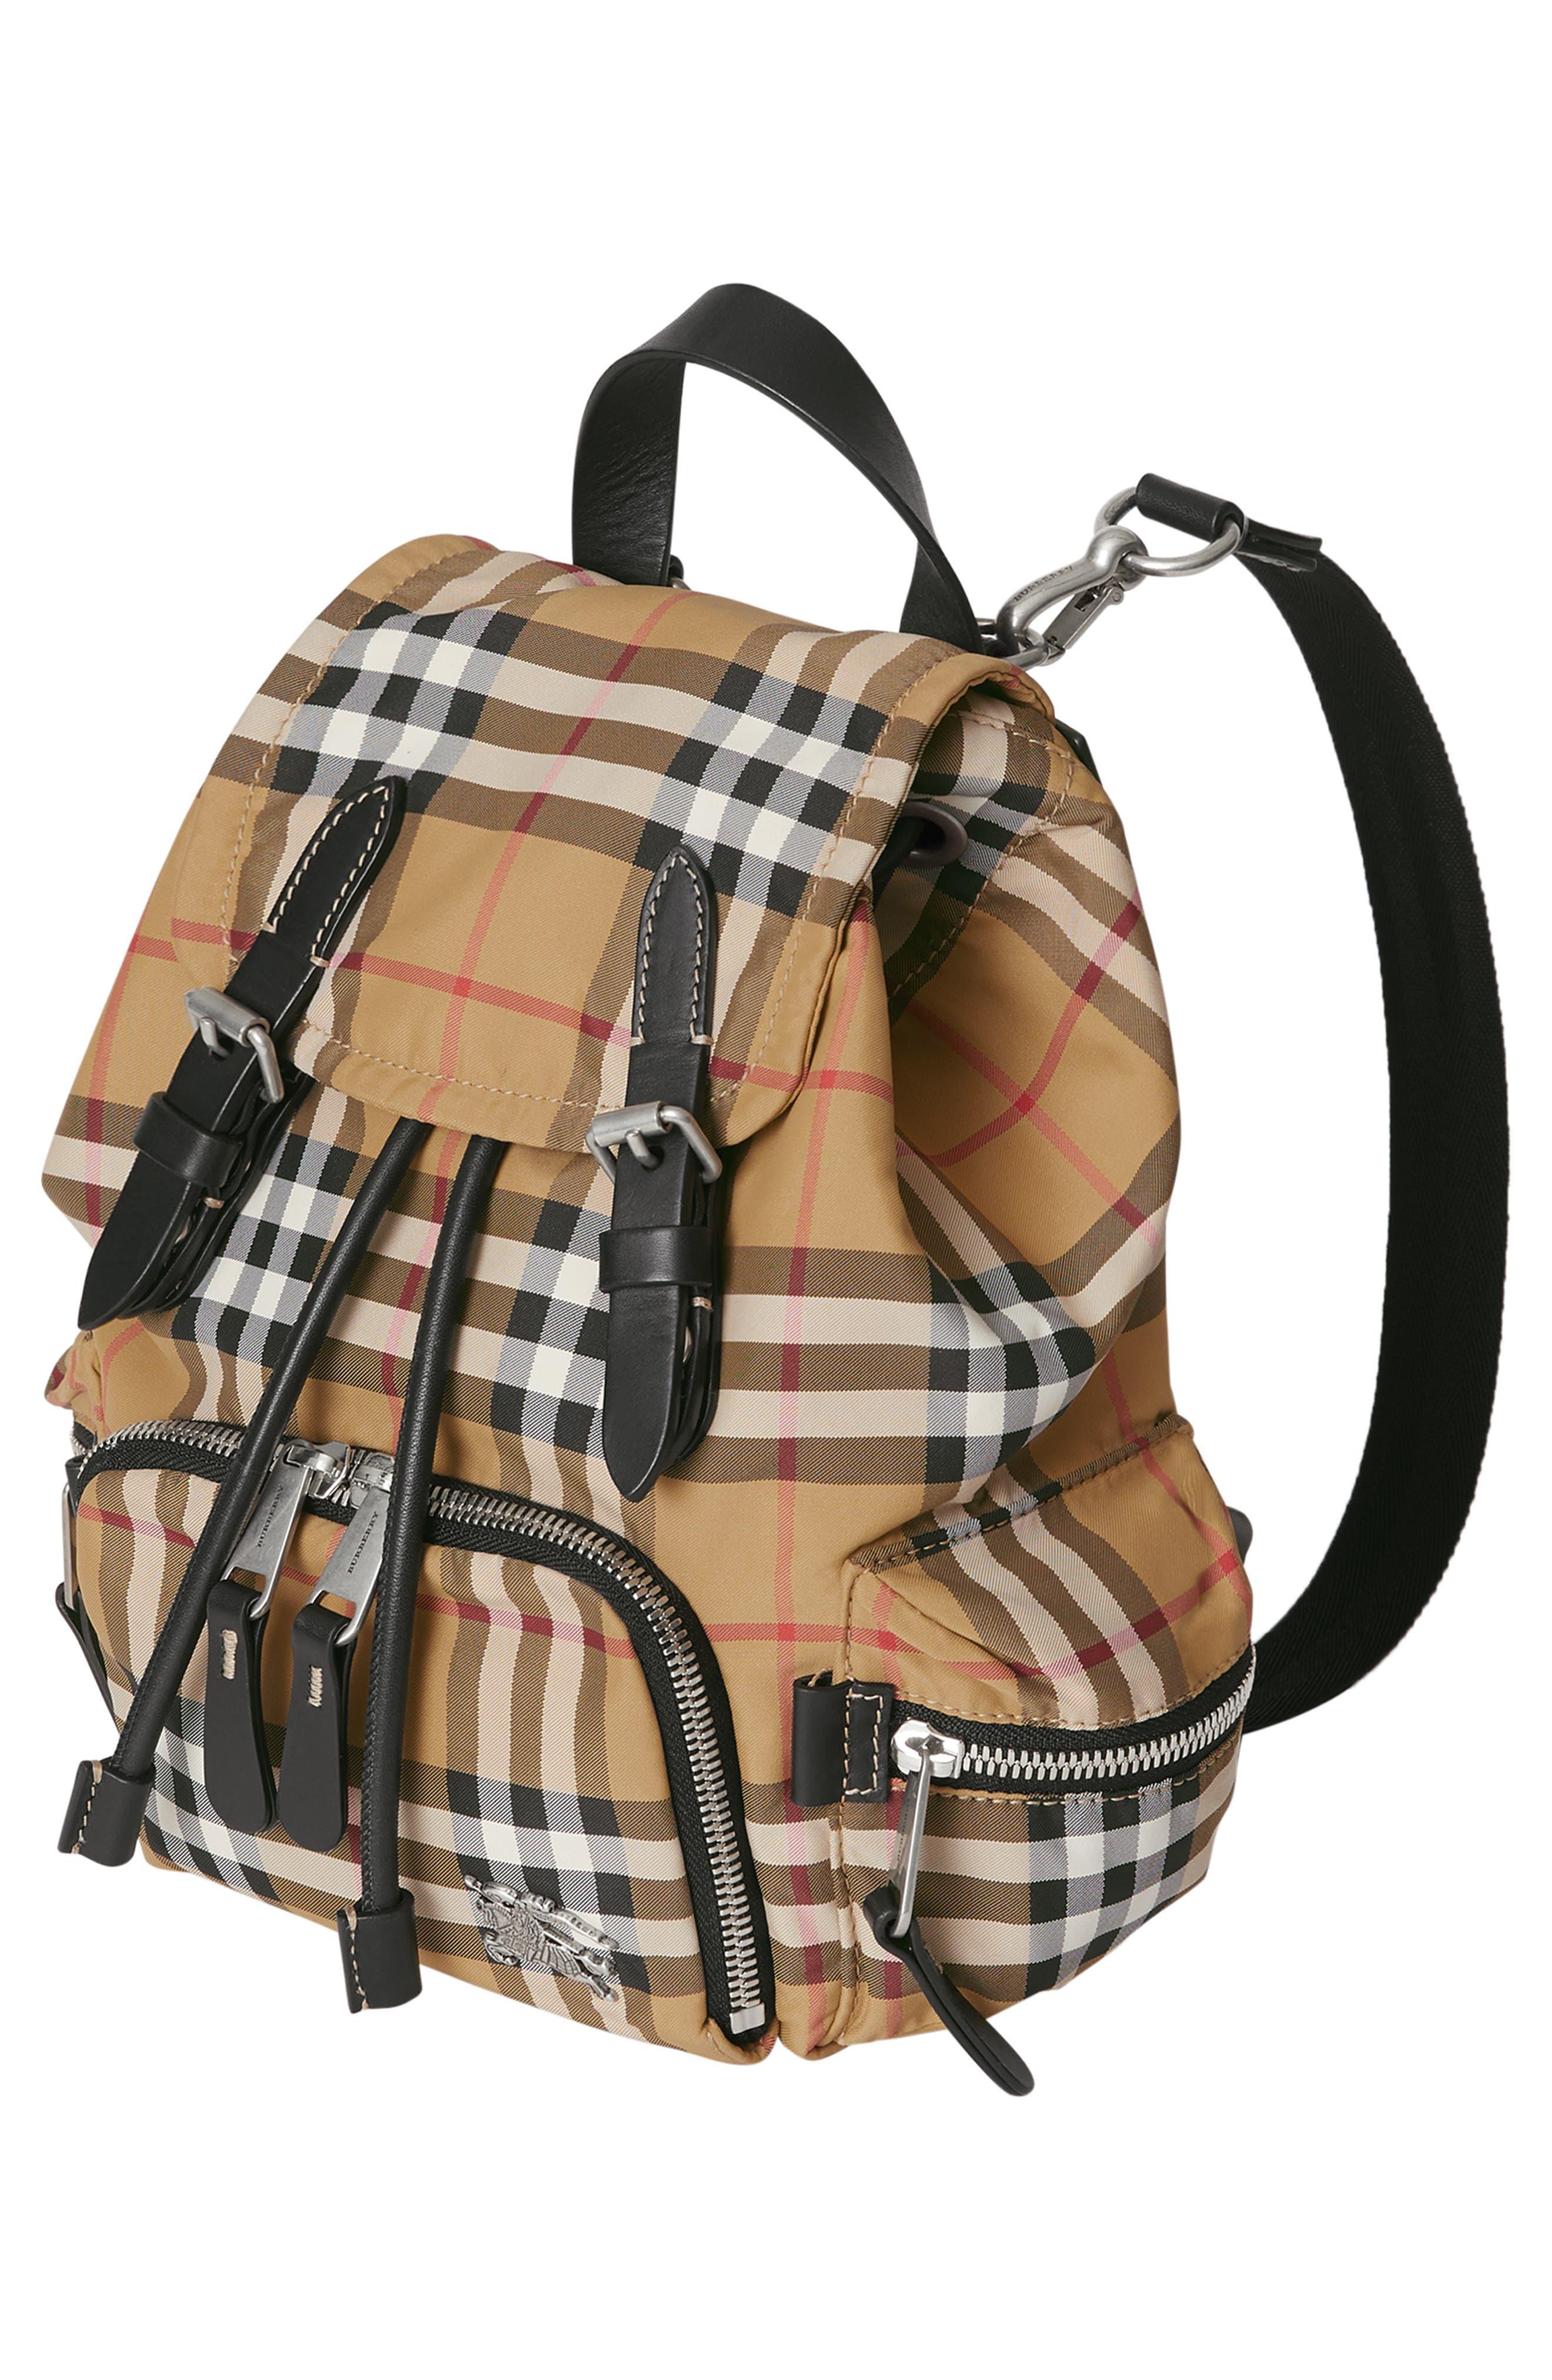 Small Rucksack Vintage Check Nylon Backpack,                             Alternate thumbnail 4, color,                             ANTIQUE YELLOW/ BLACK